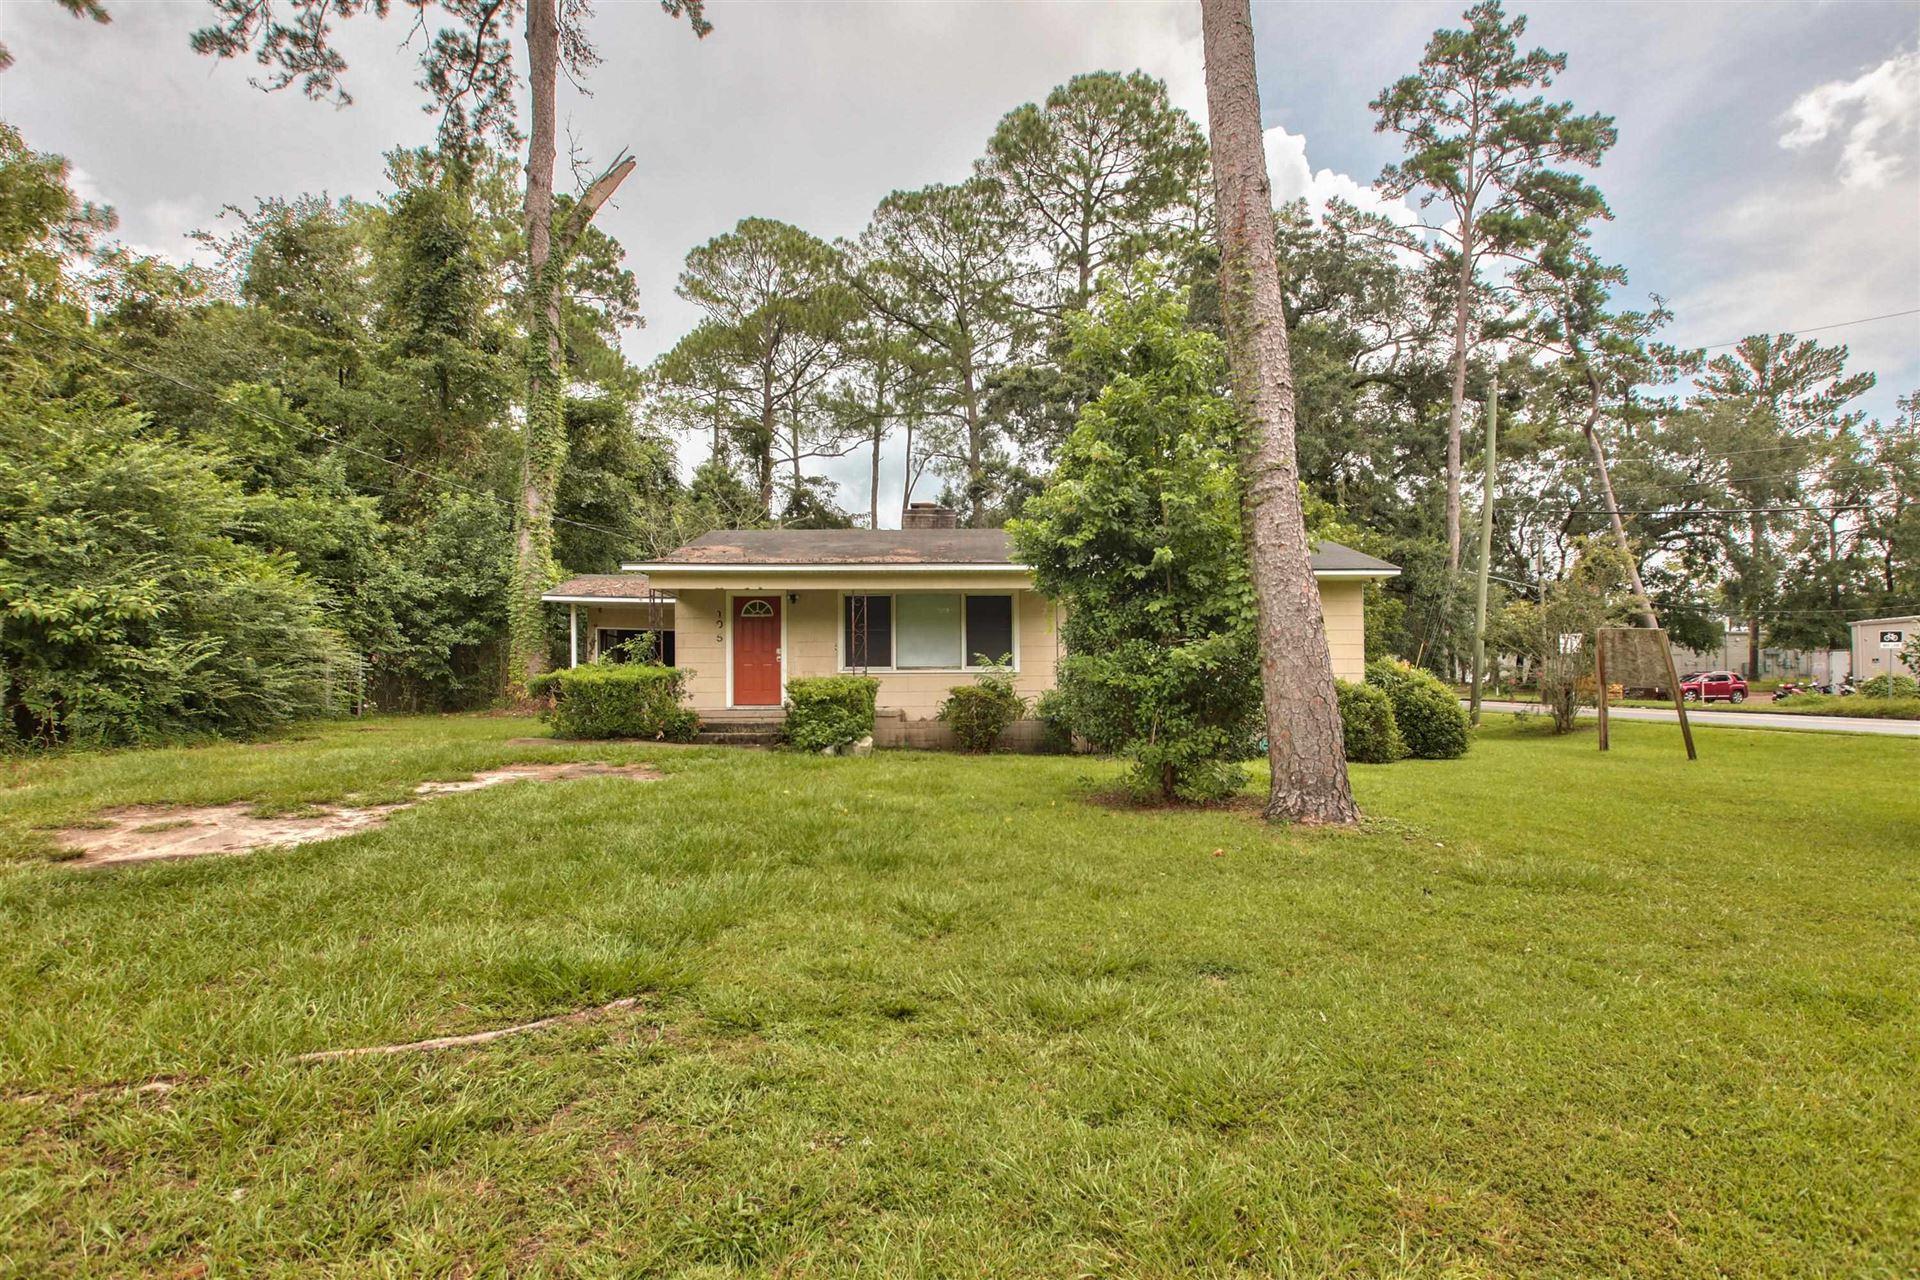 Photo of 105 Dixie, TALLAHASSEE, FL 32304 (MLS # 336966)